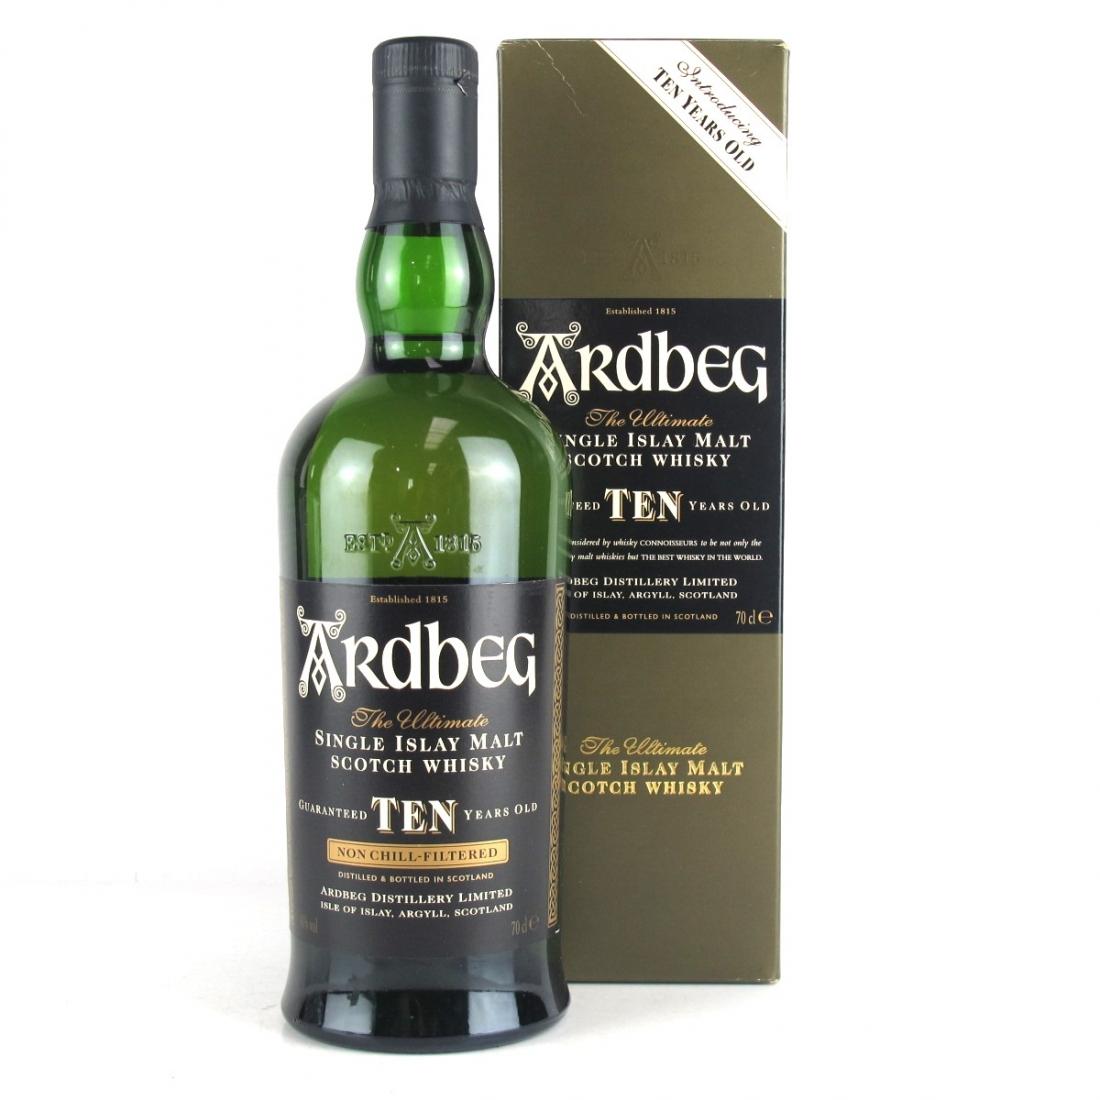 Ardbeg 10 Year Old / Introducing